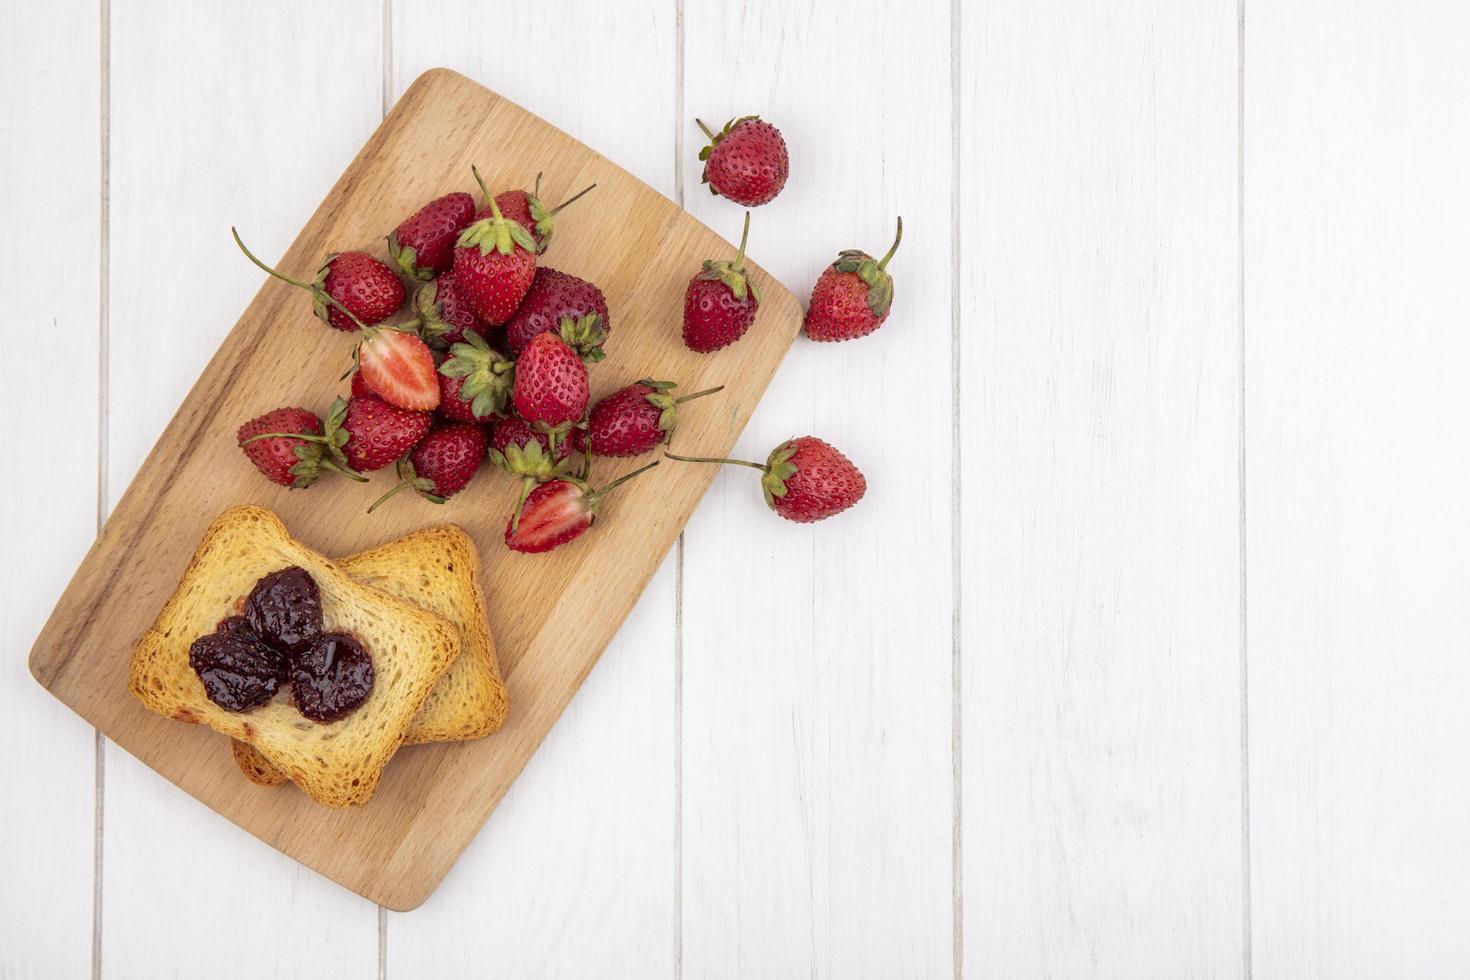 Vista superior de fresas frescas sobre una tabla de madera foto